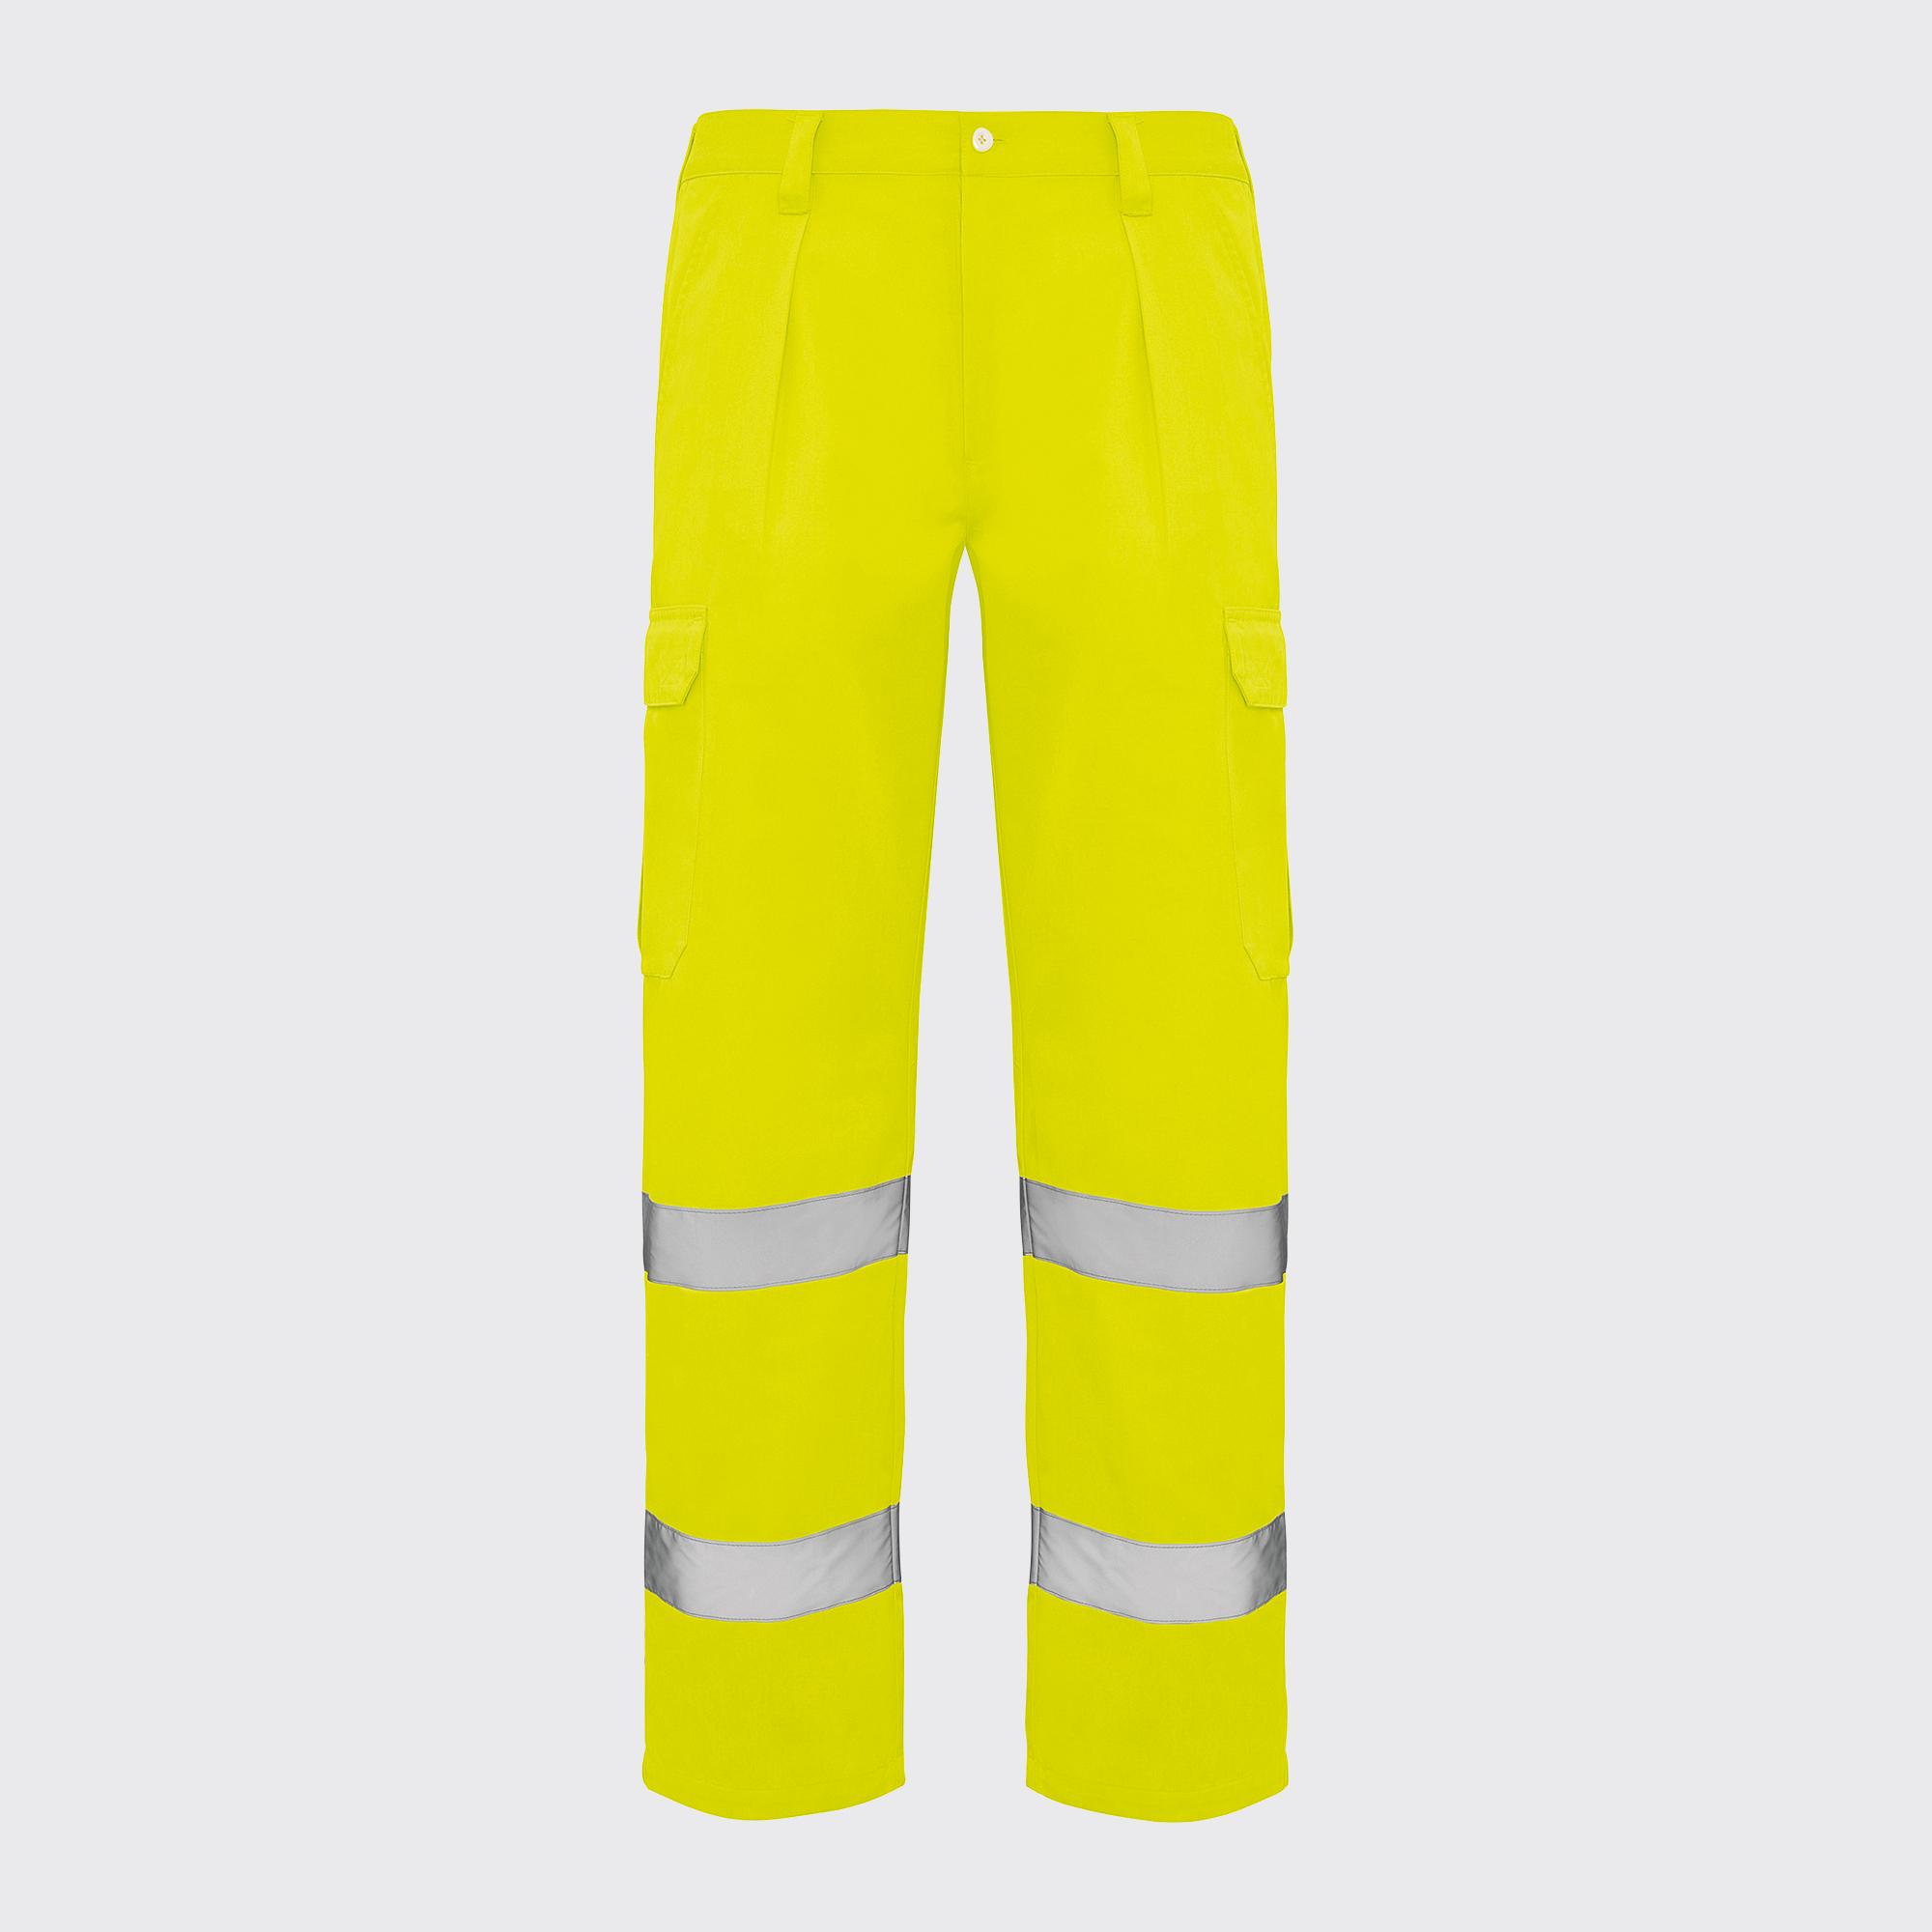 Pantalones amarillo fluor alta visibilidad Rolly